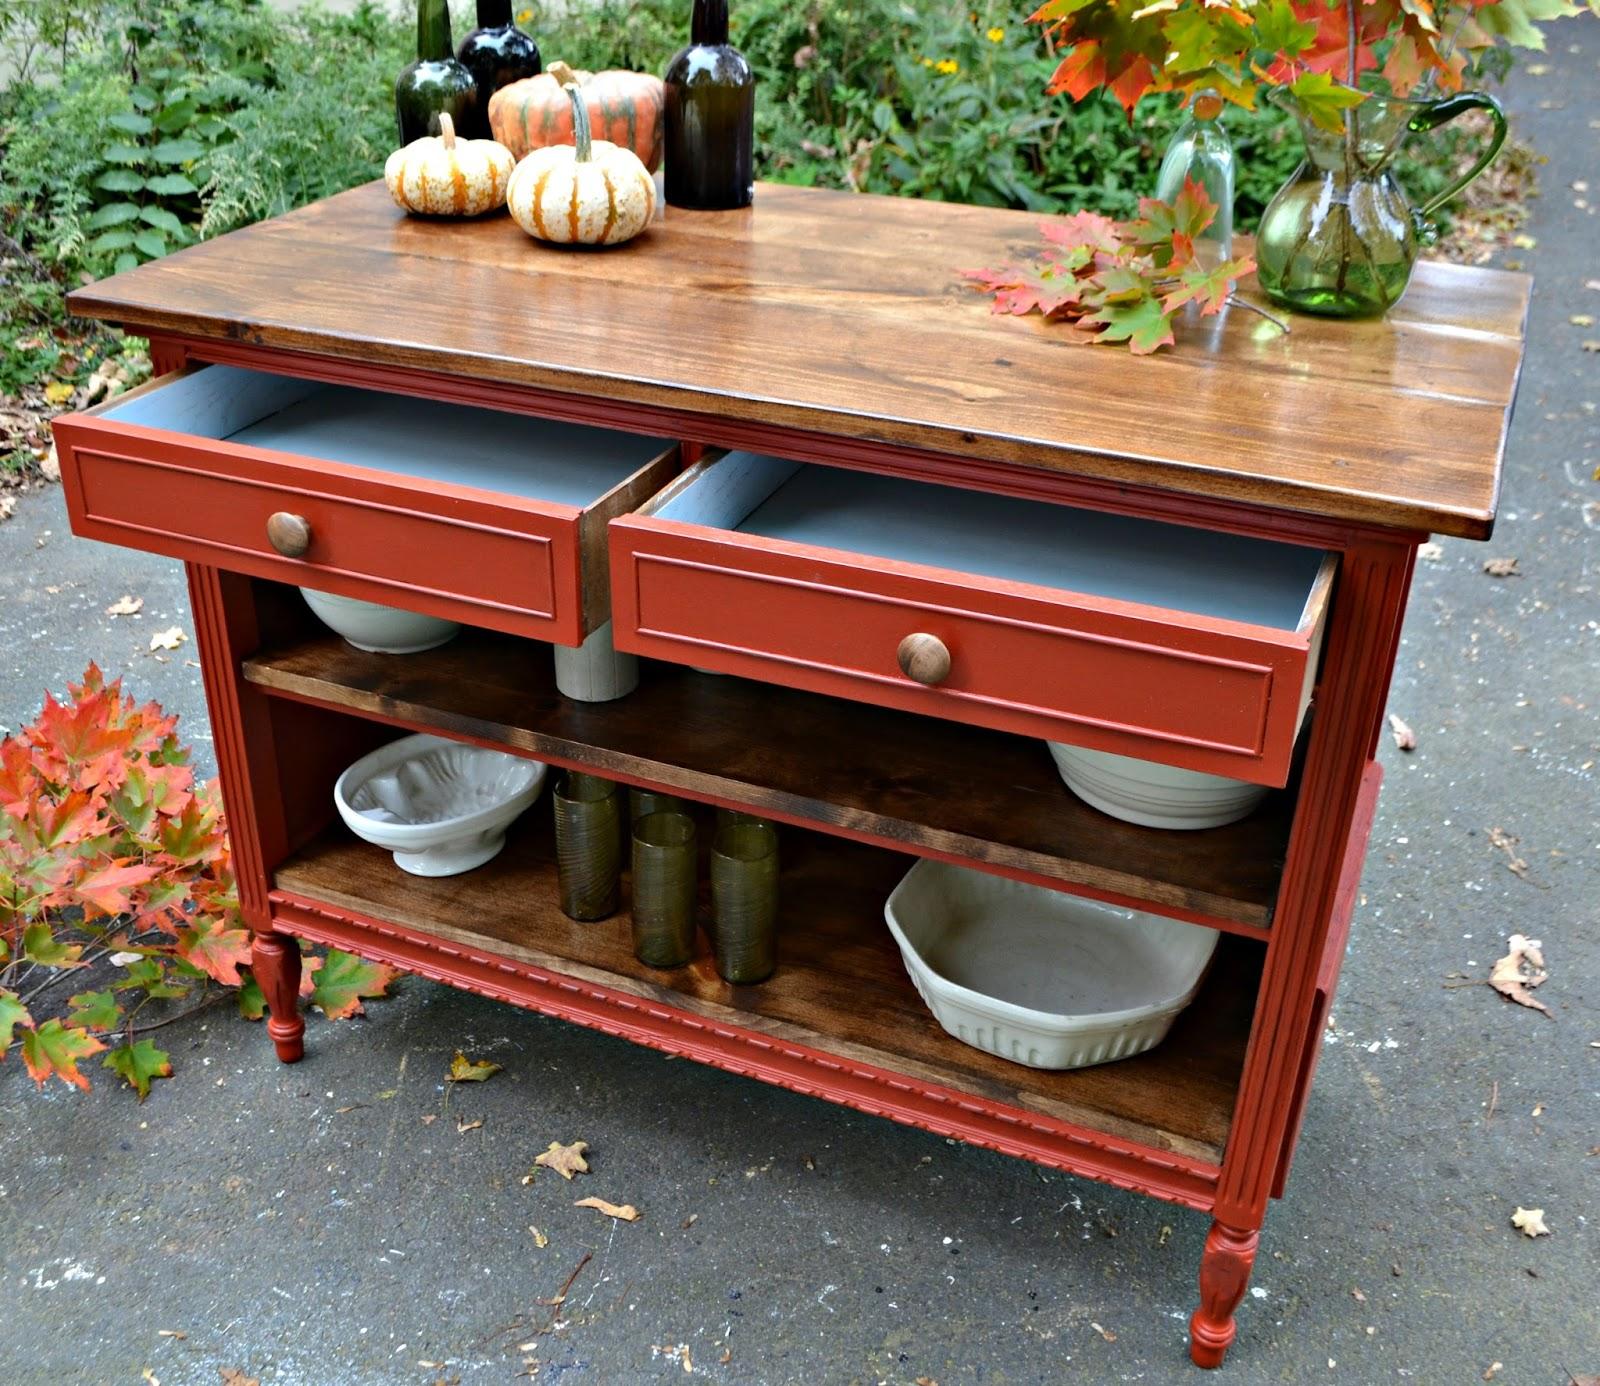 Vintage Kitchen Island: Heir And Space: An Antique Dresser Turned Kitchen Island